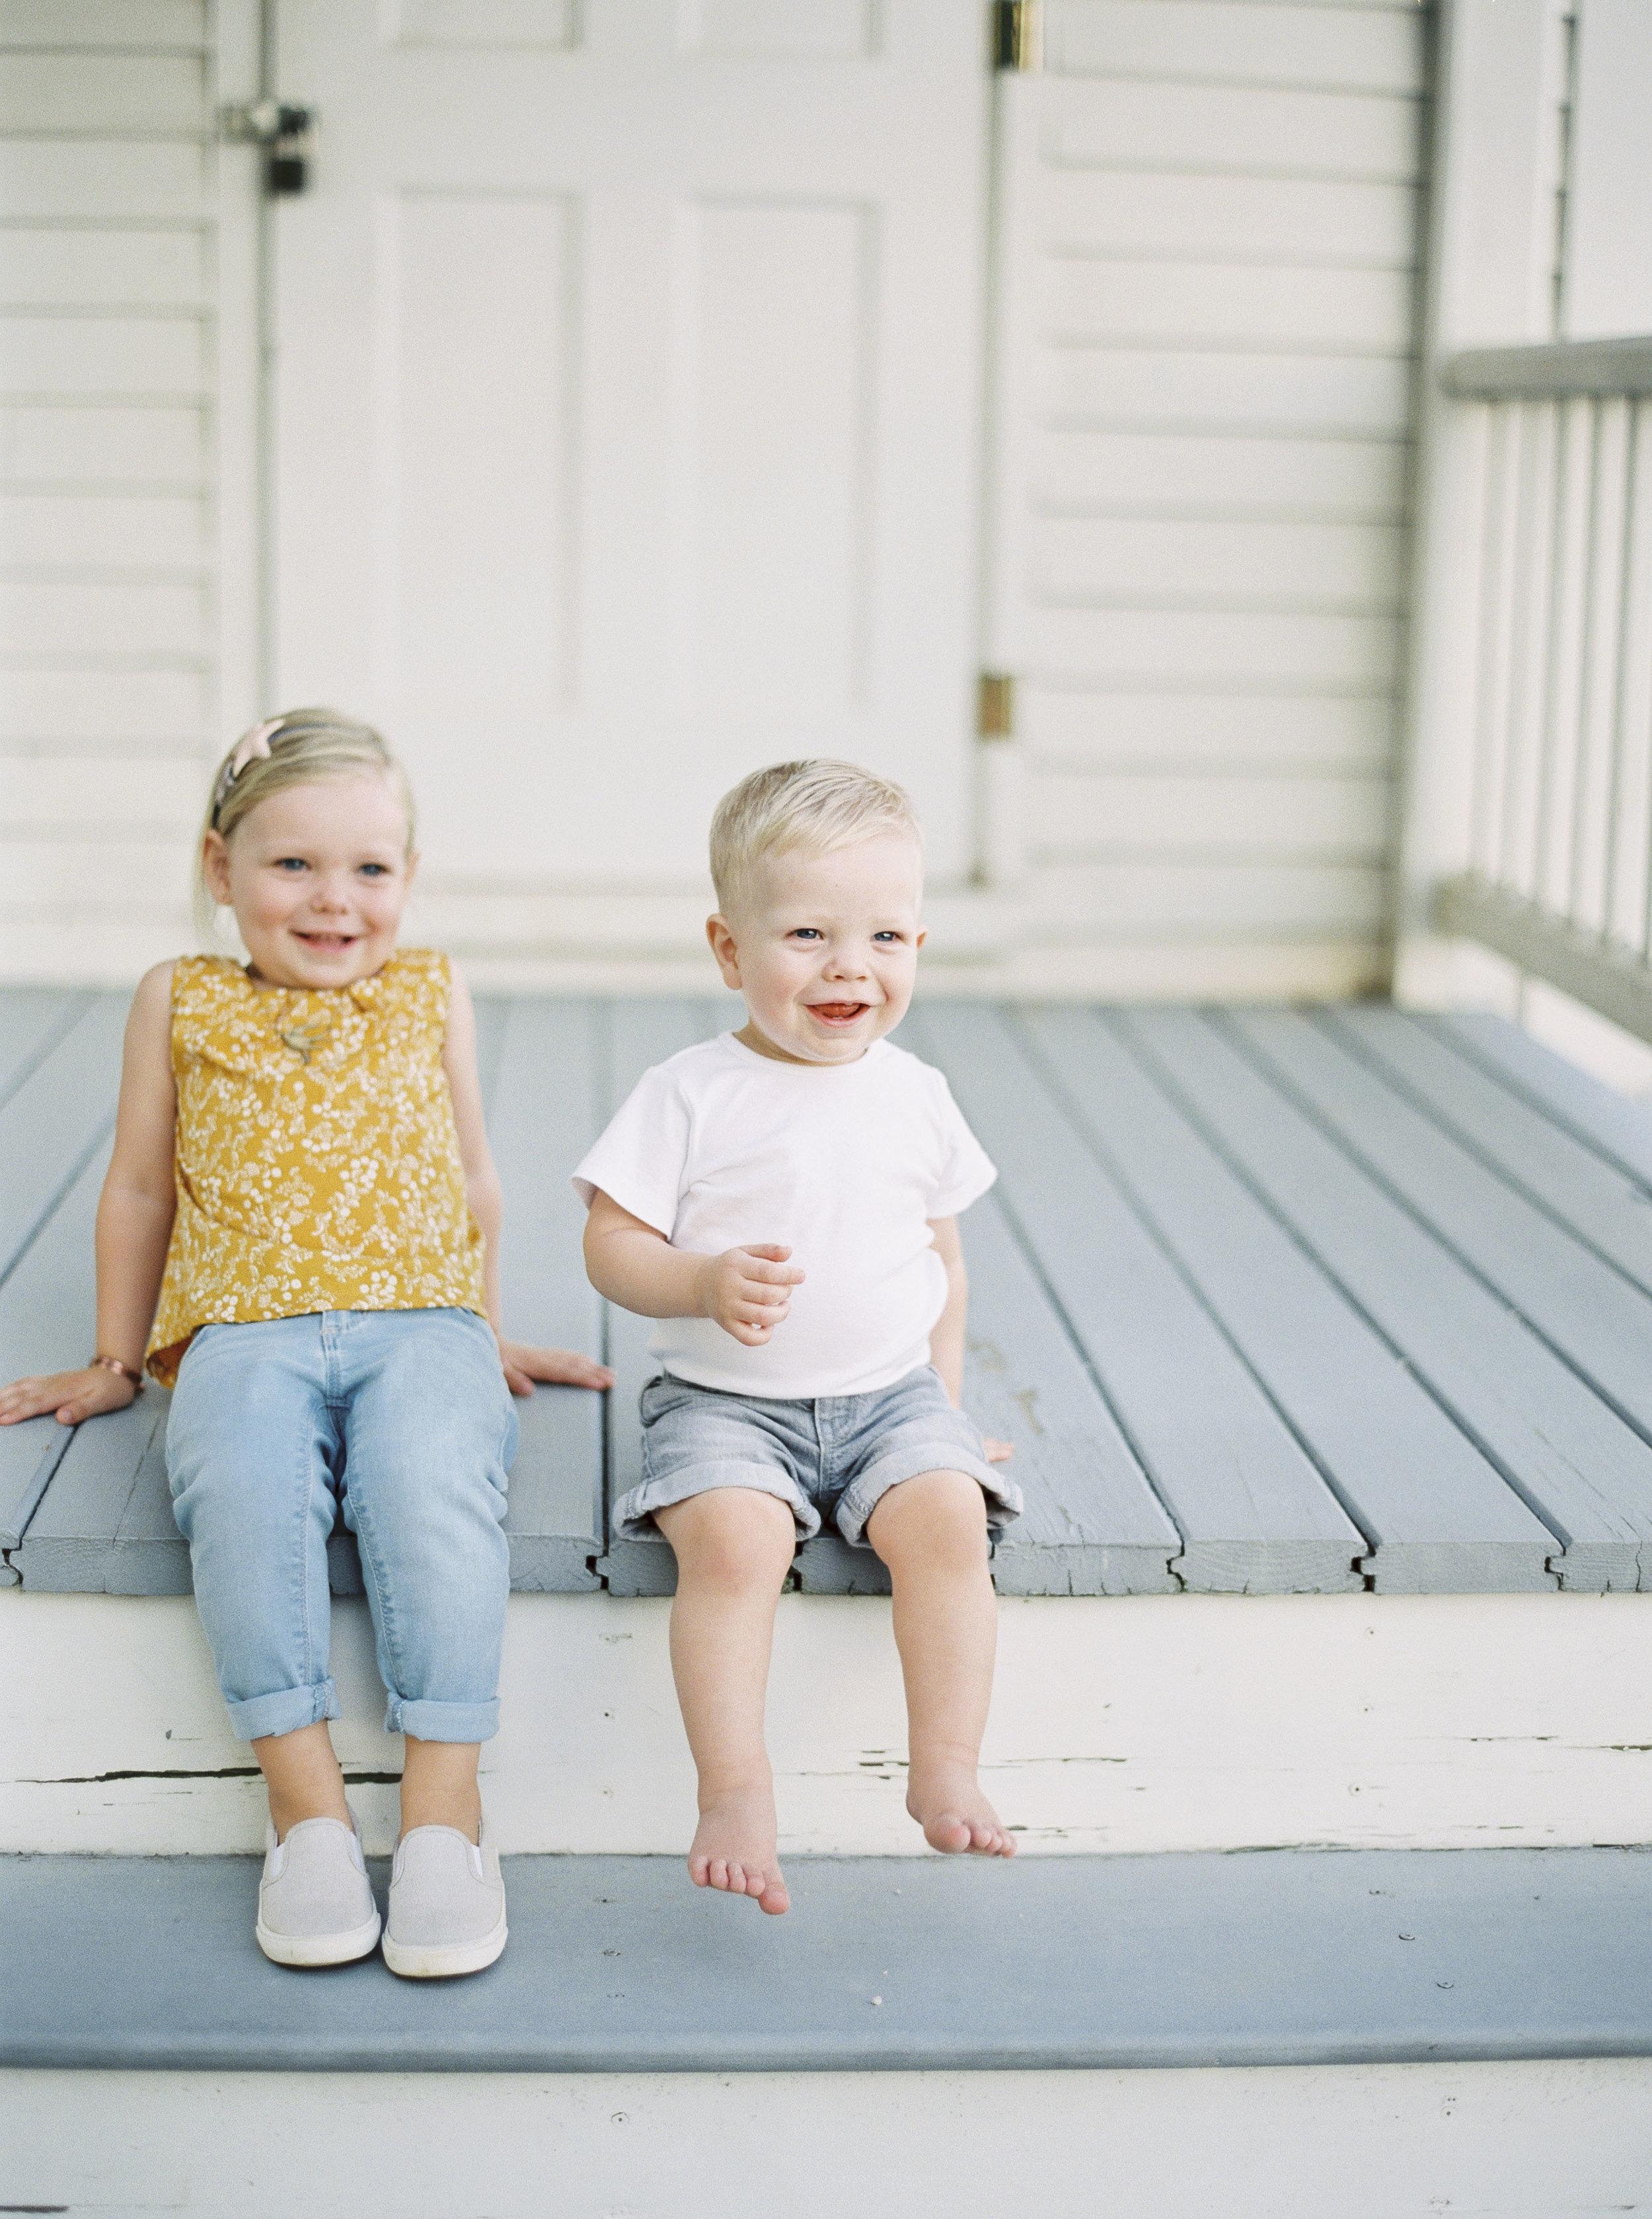 DC family photos Amanda Lenhardt Photography Dallas Based Photographer